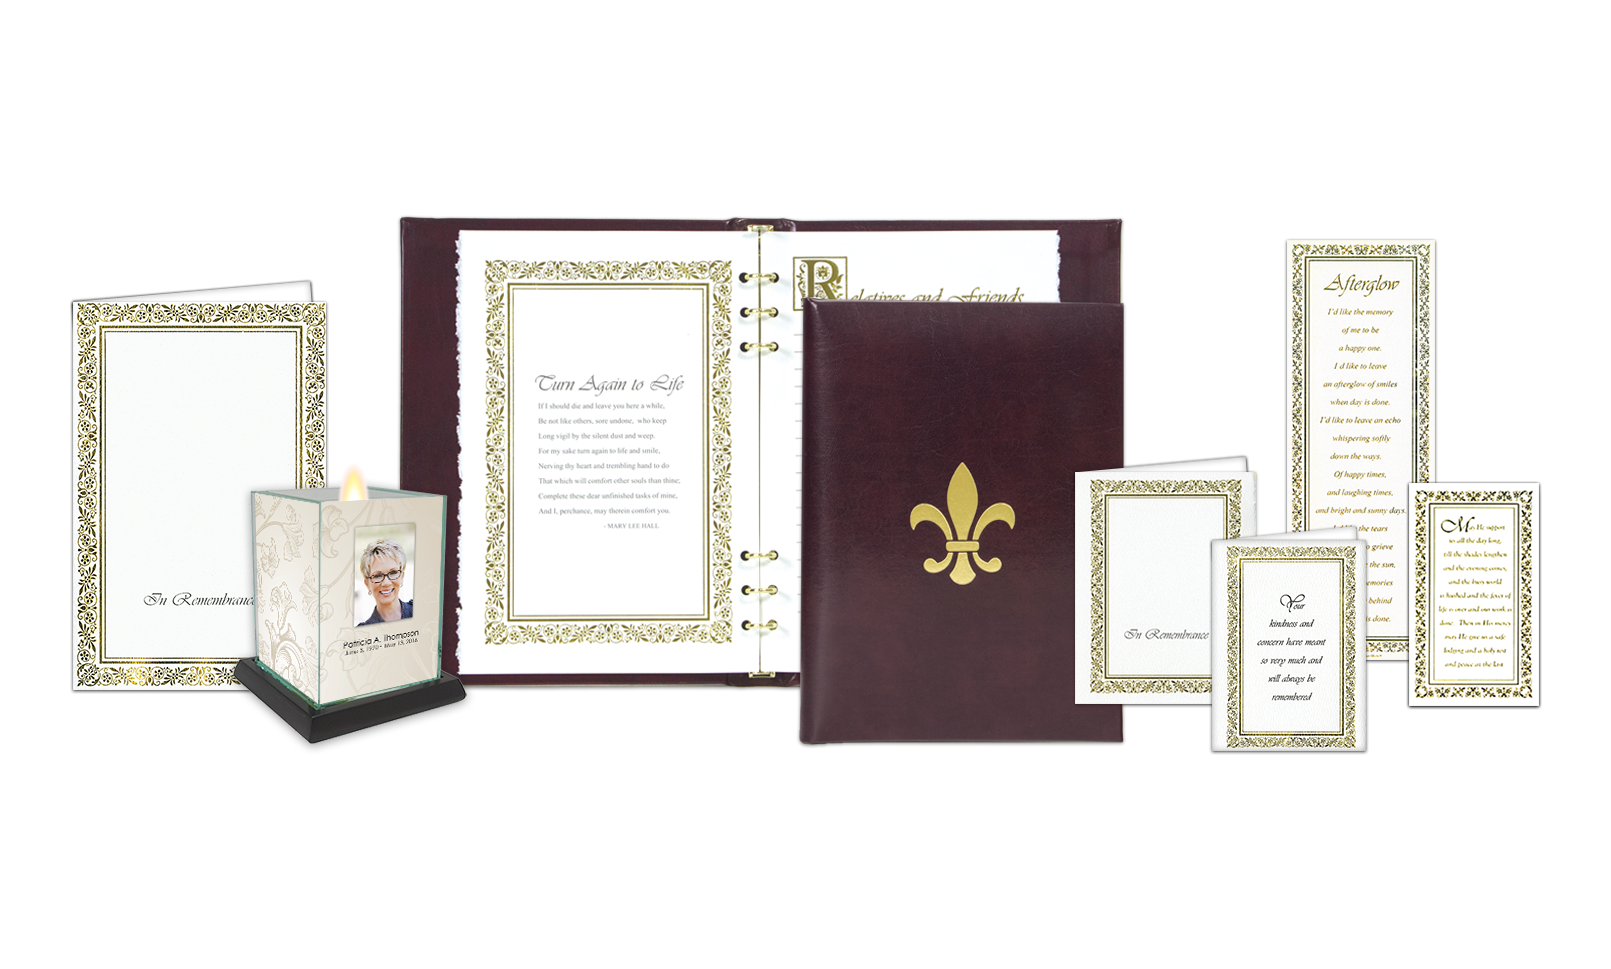 ROL Fleur de Lis with Deckle Edge Interior Burgundy Leather Series 323 DK